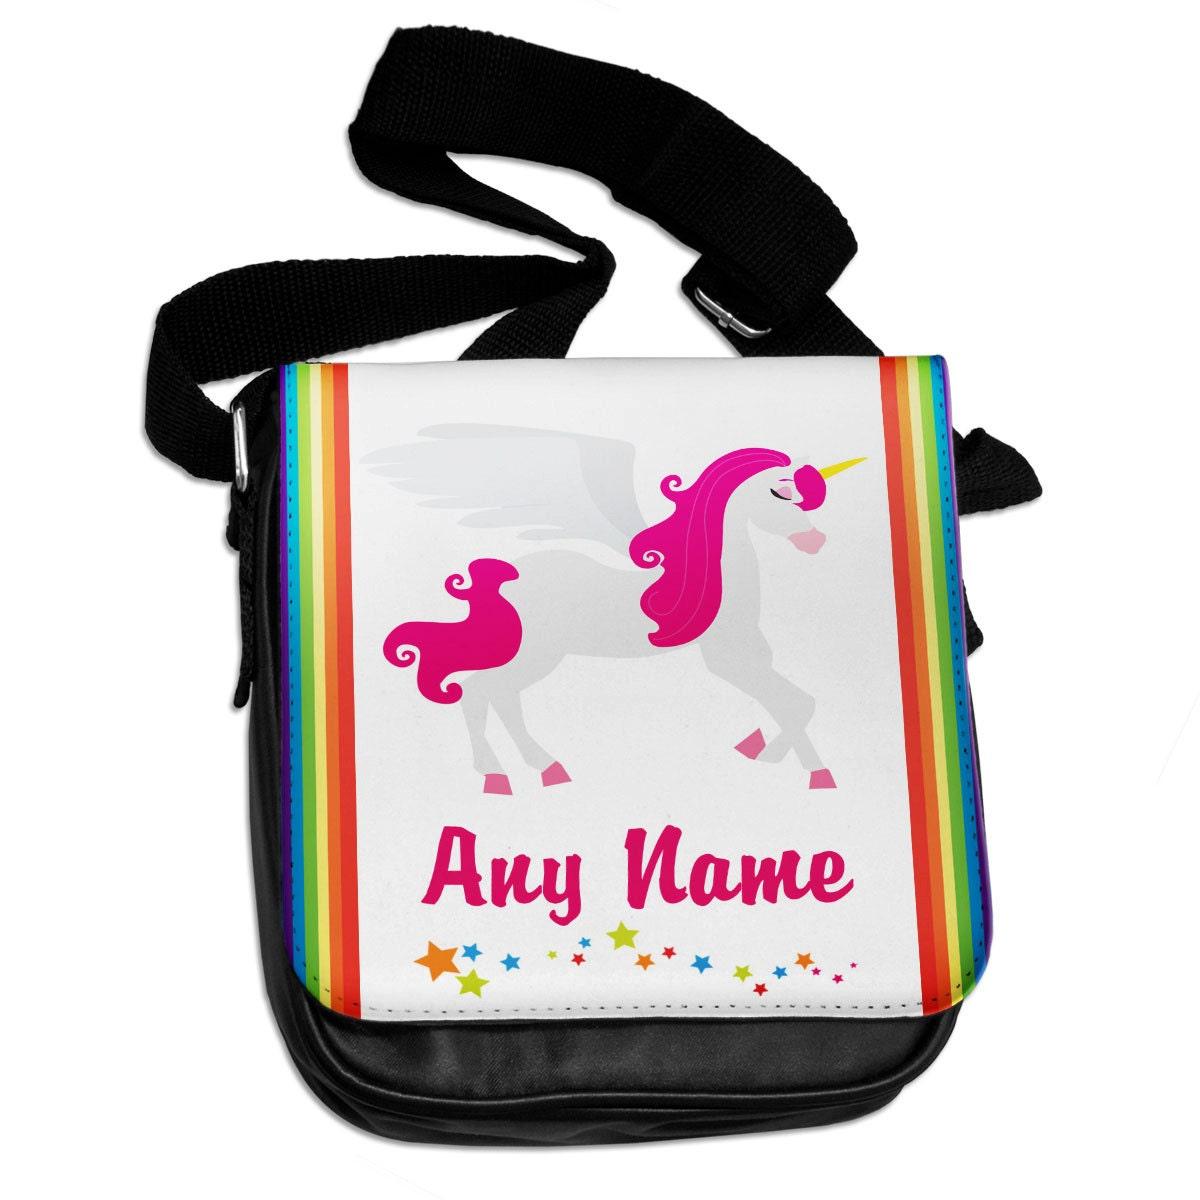 Personalised Pink Unicorn 01 Shoulder Bag 145  back to school  school  gym bag  pink  blue